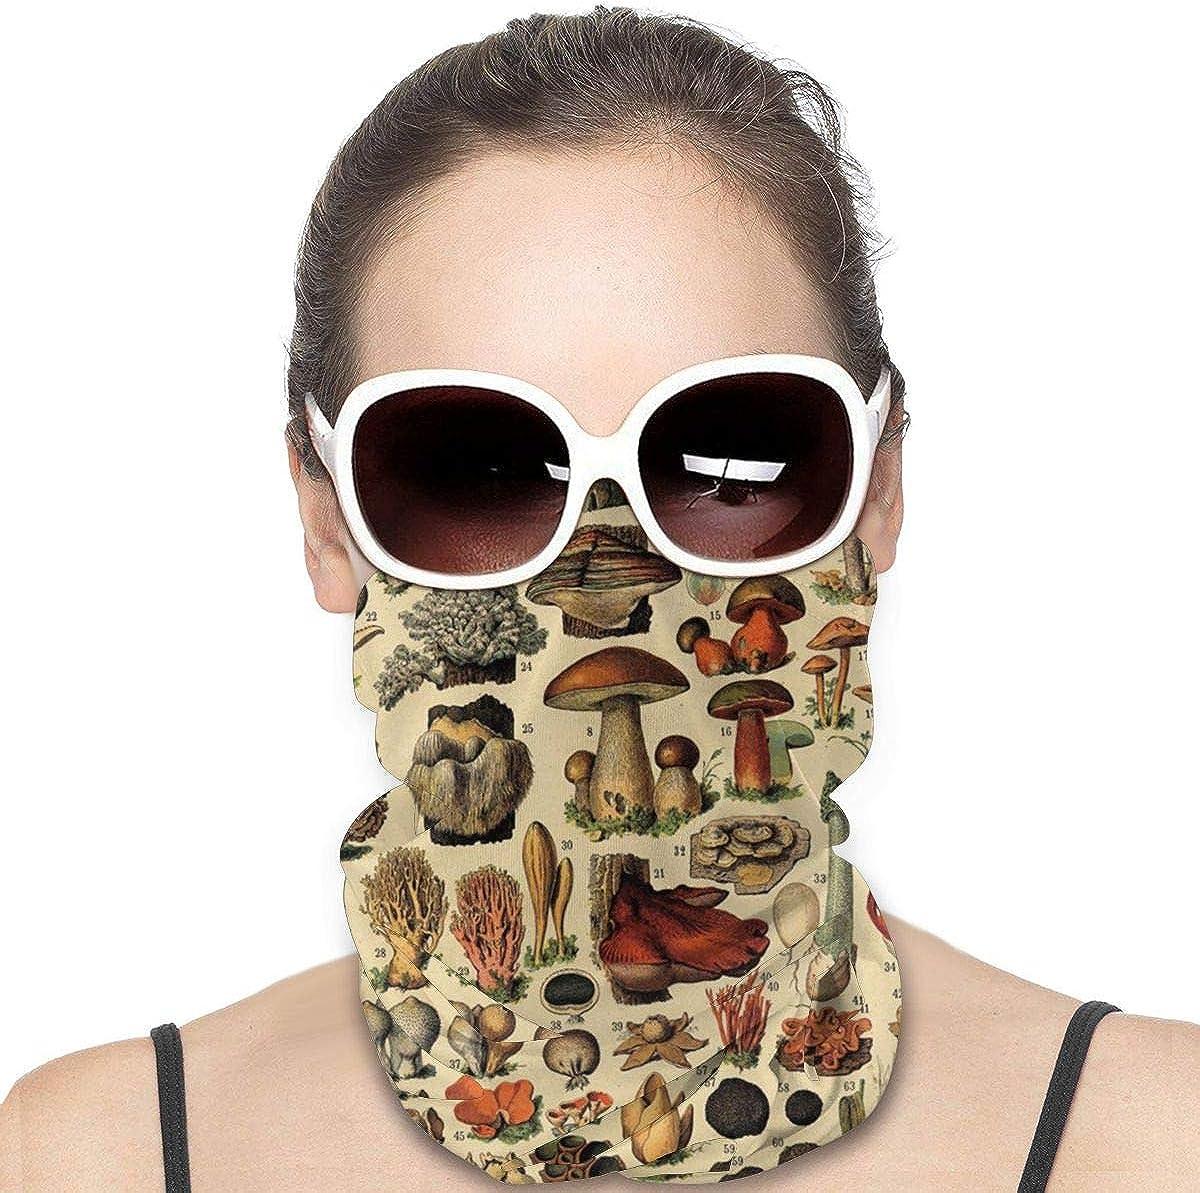 JinSPef Bandana Face Mask - Popular Mushroom Collage Bandana Face Mask Neck Gaiter Head Bands Neck Gaiters for Men Headbands Face Mask Bandana